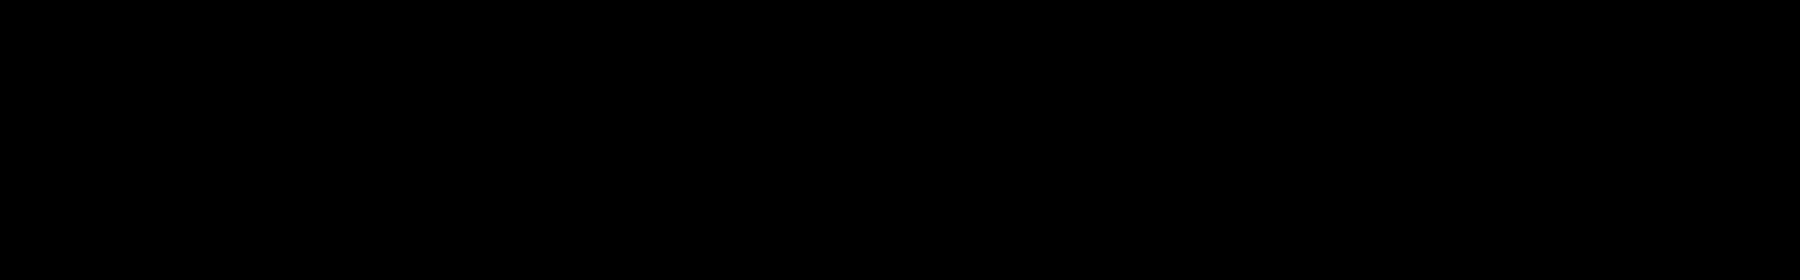 Tunecraft OVO Chill Hop Vol.1 audio waveform